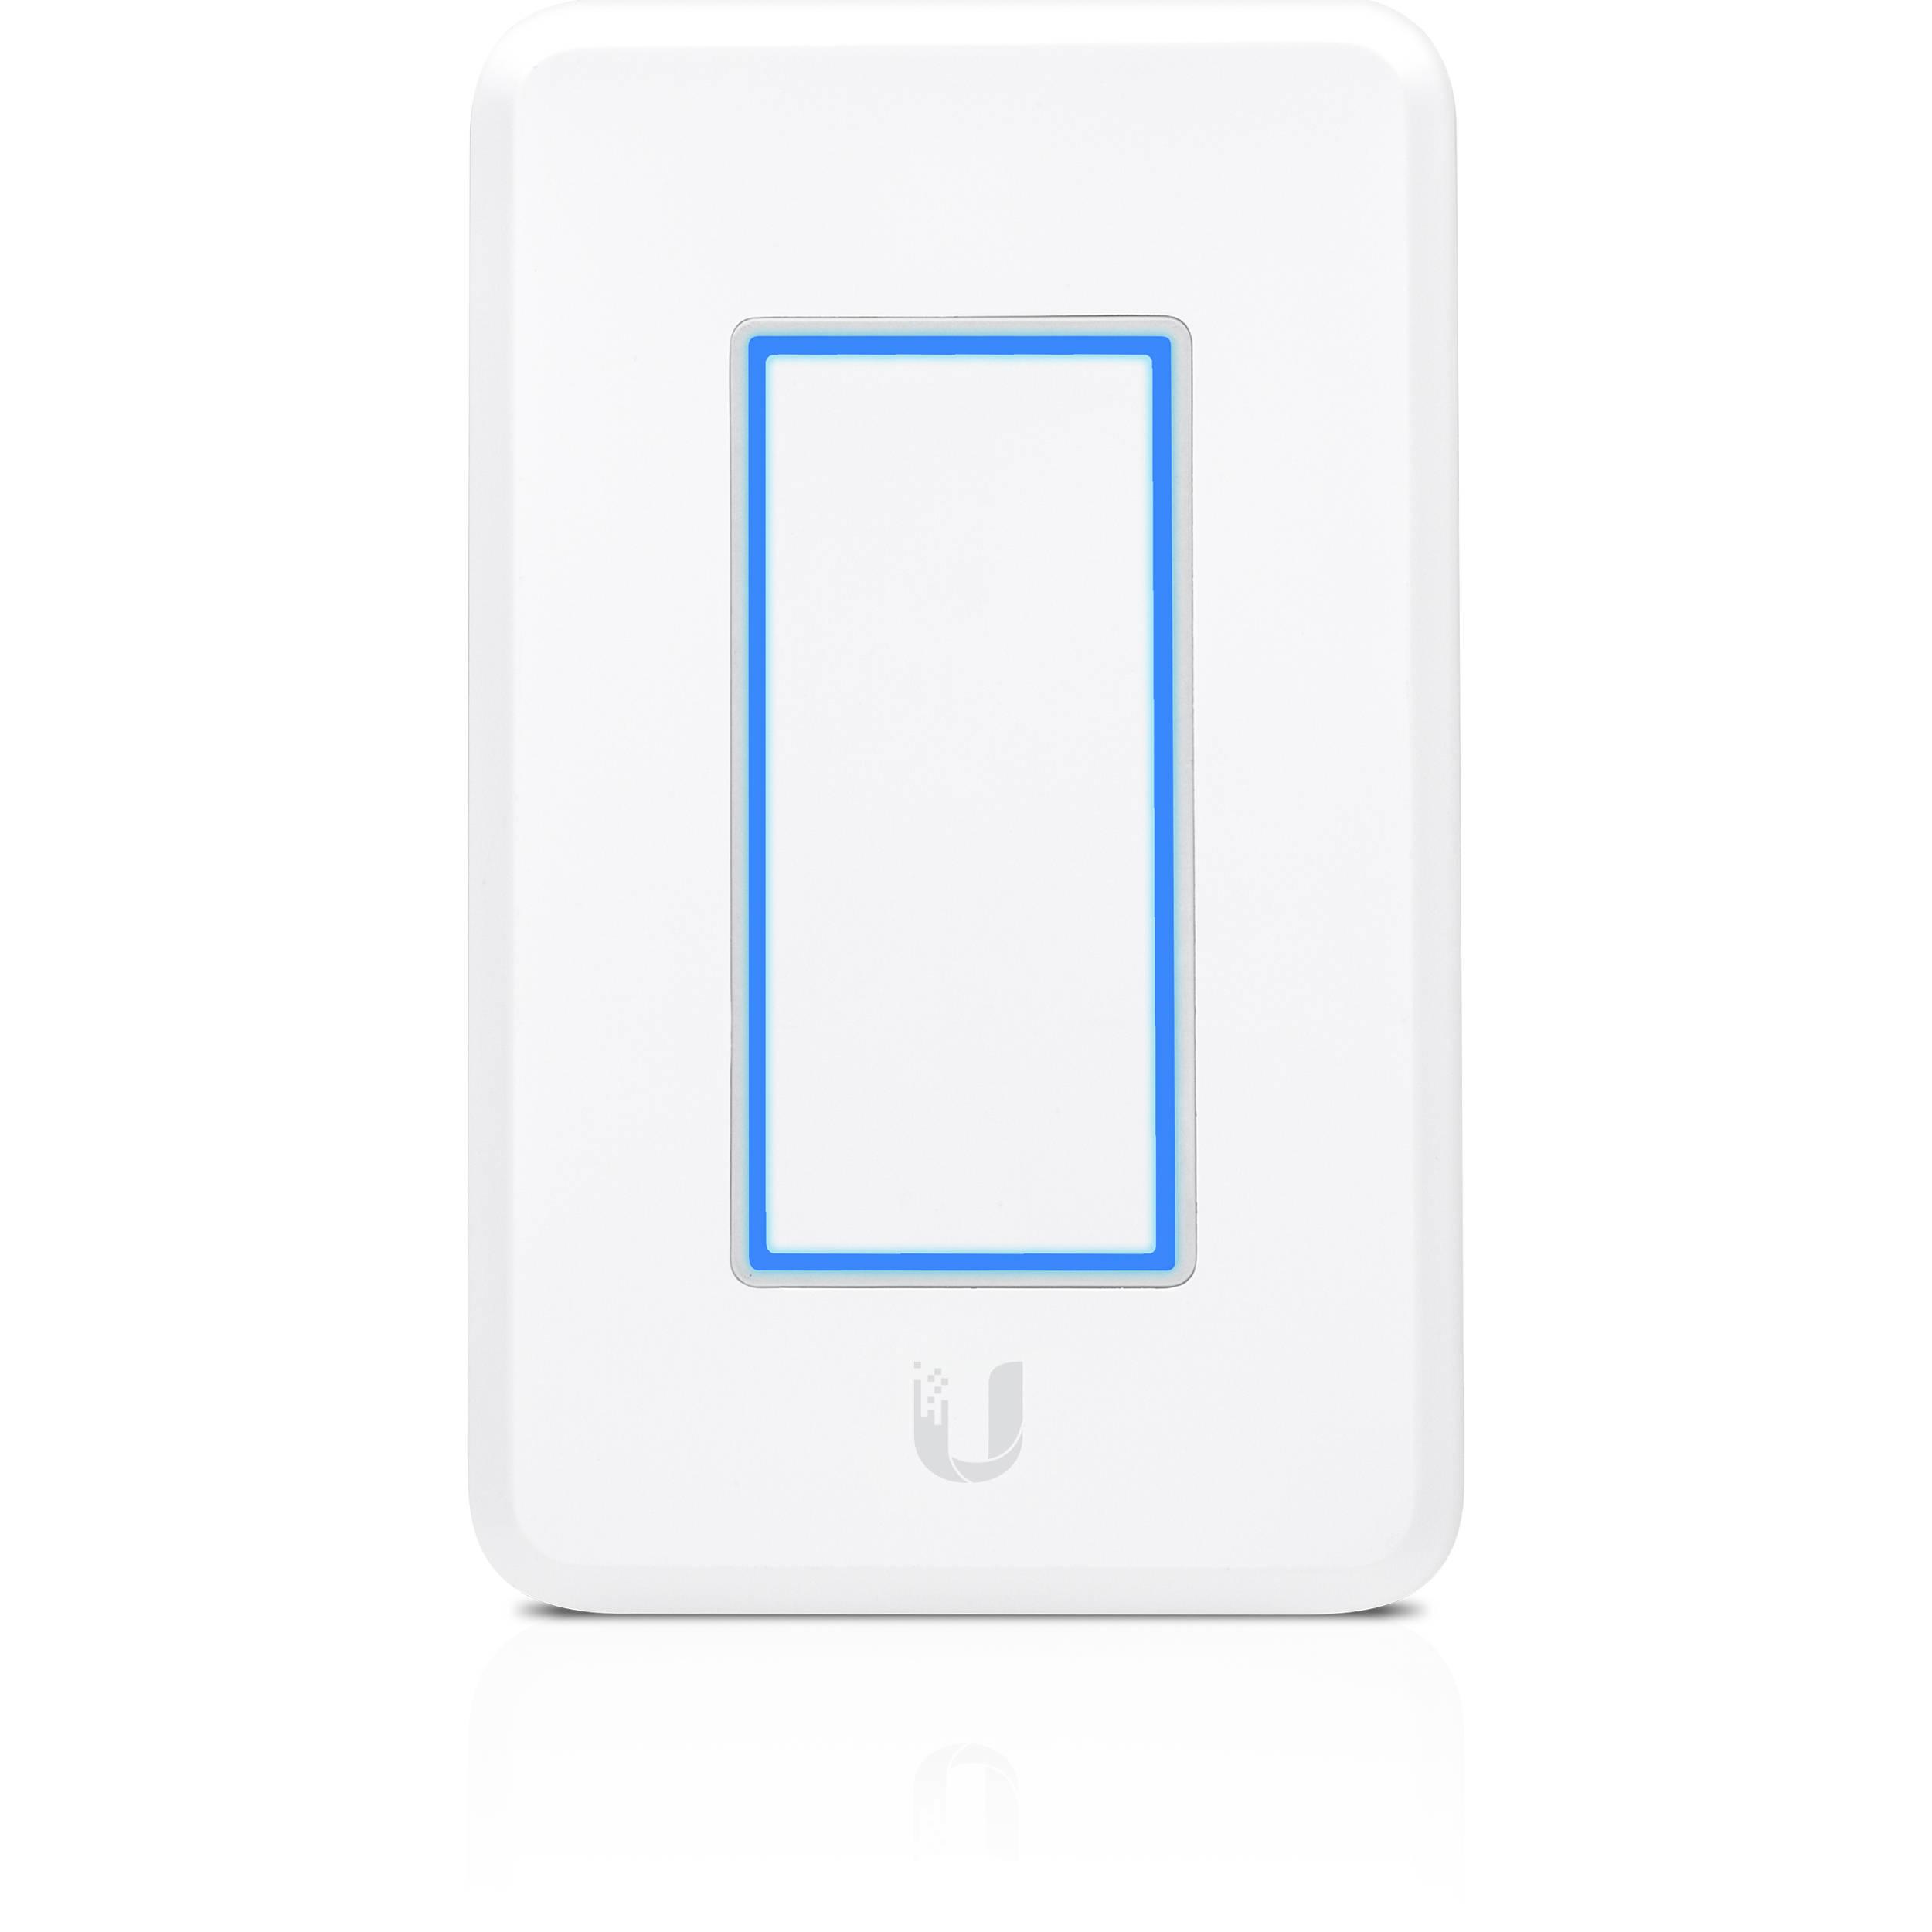 Ubiquiti Networks Udim At Unifi Dimmer Switch Udim At B Amp H Photo